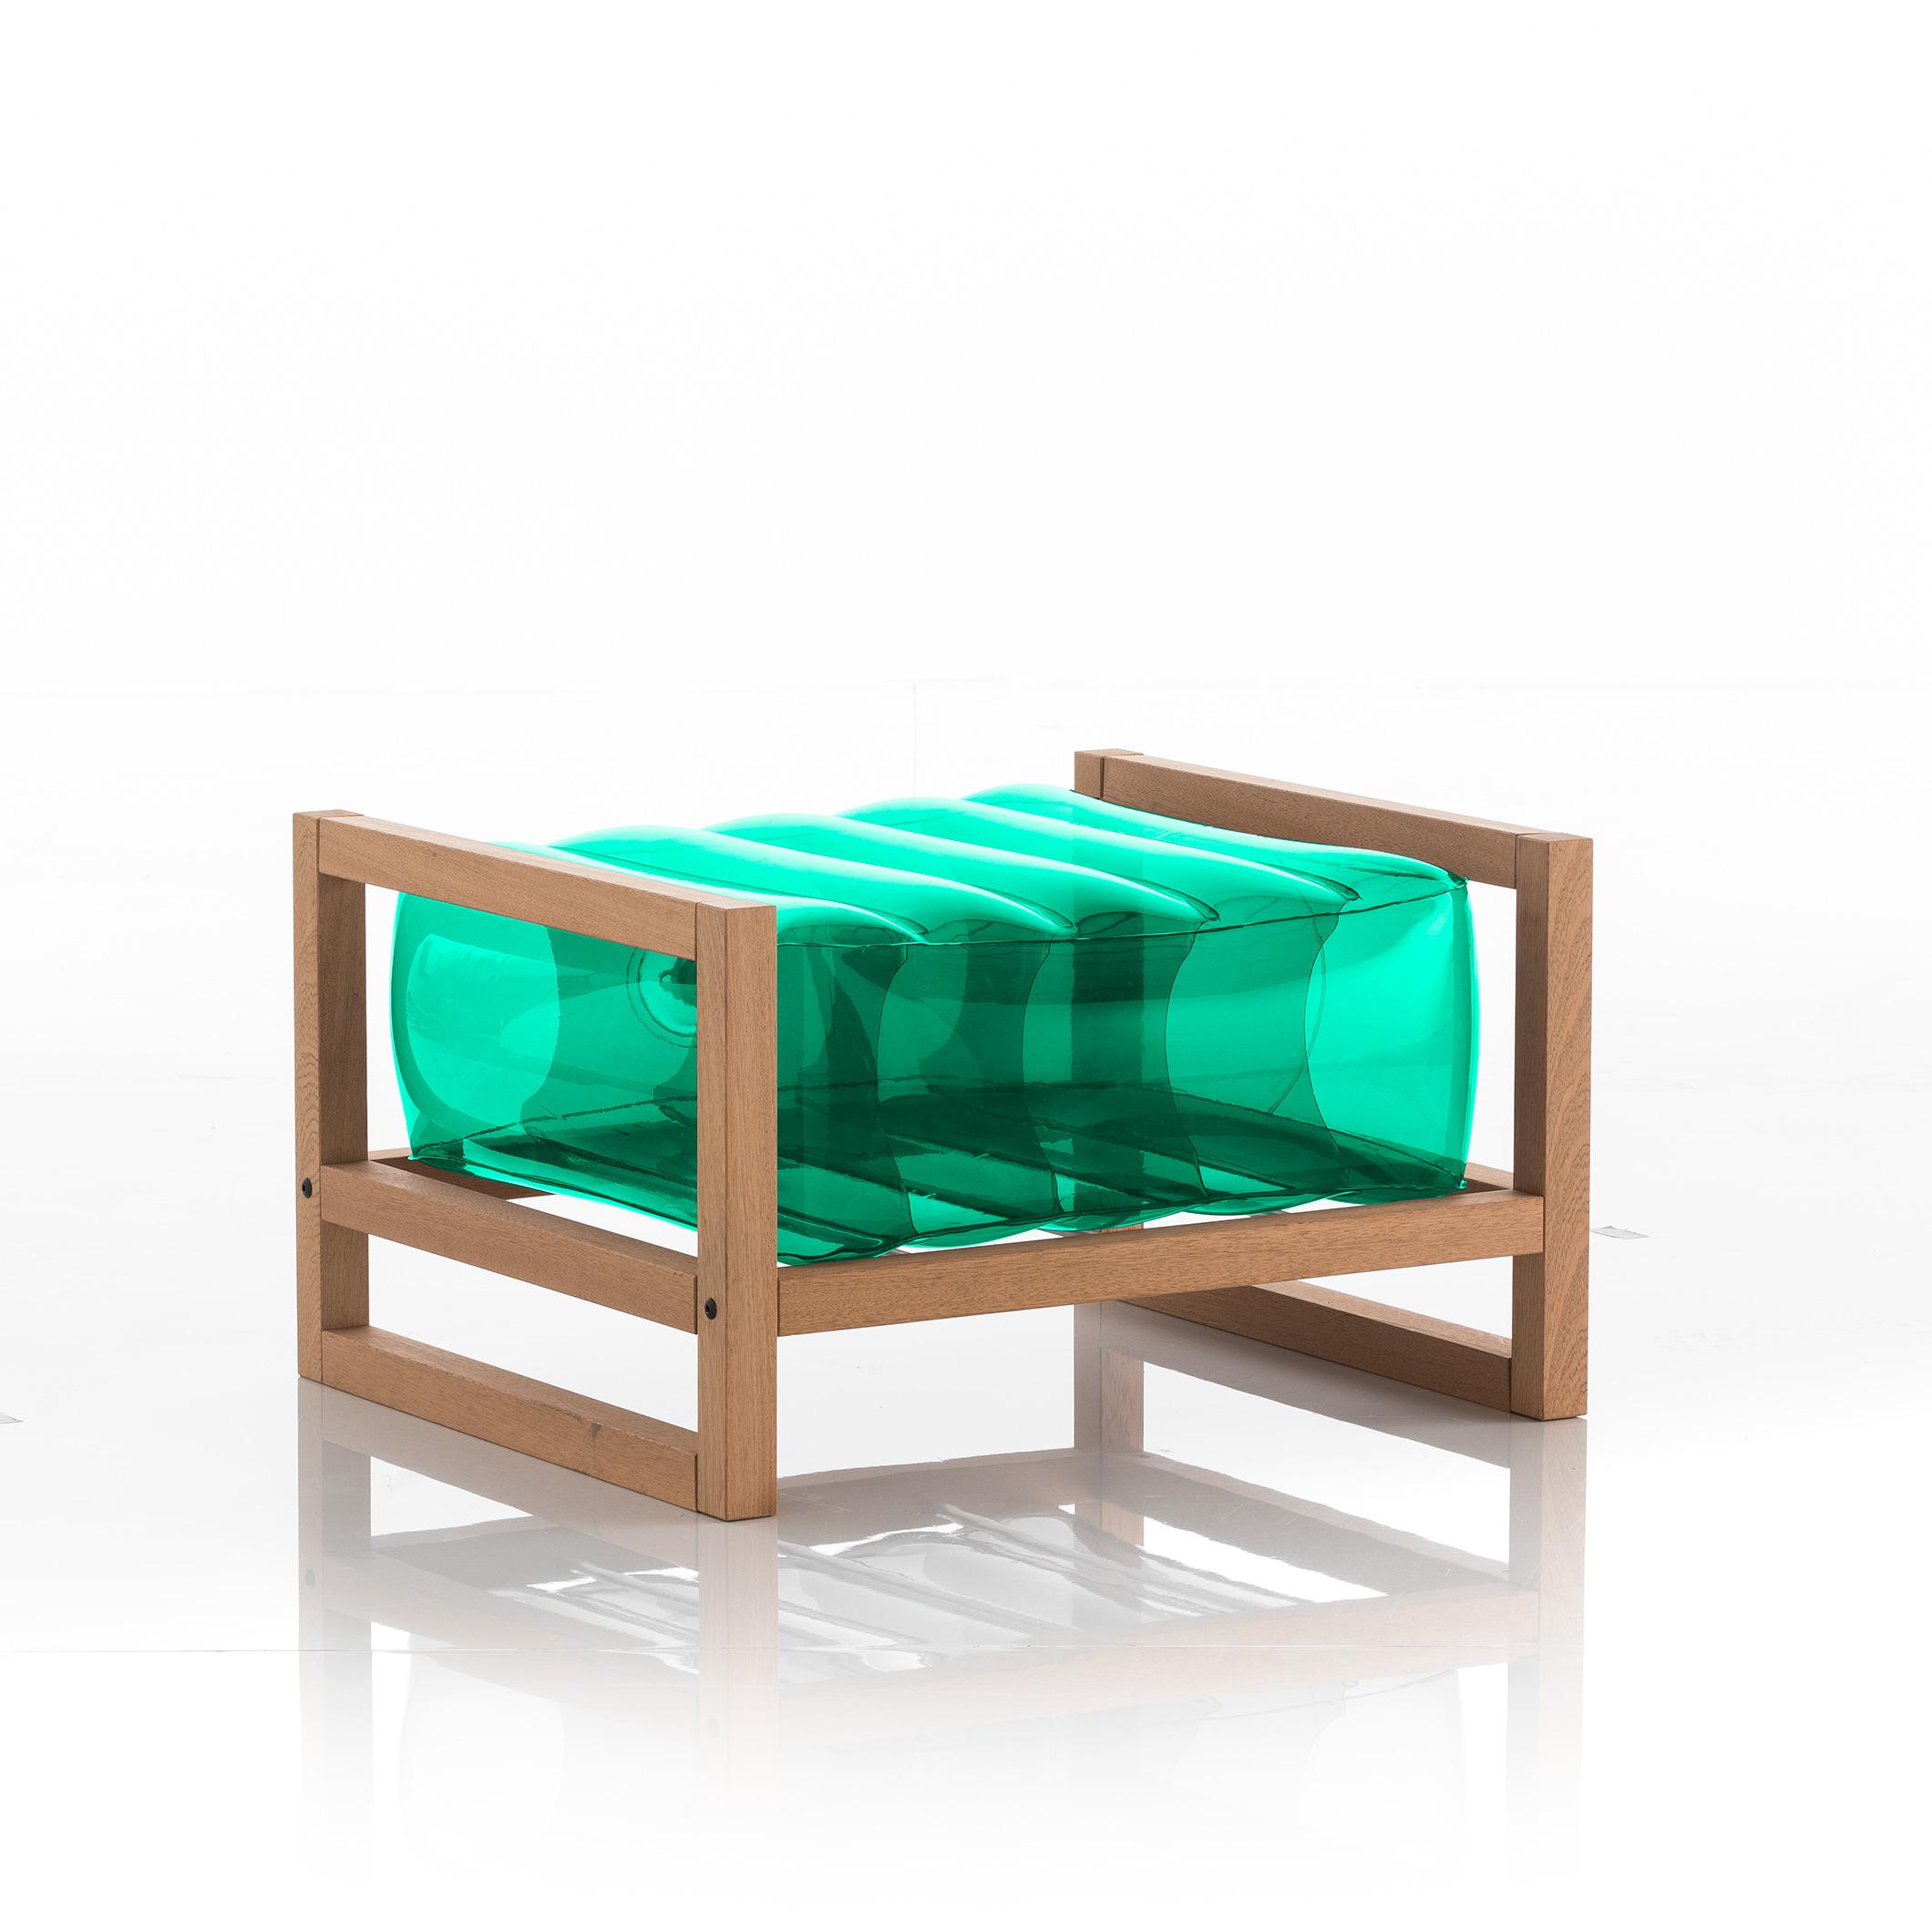 Pouf en bois et tpu vert